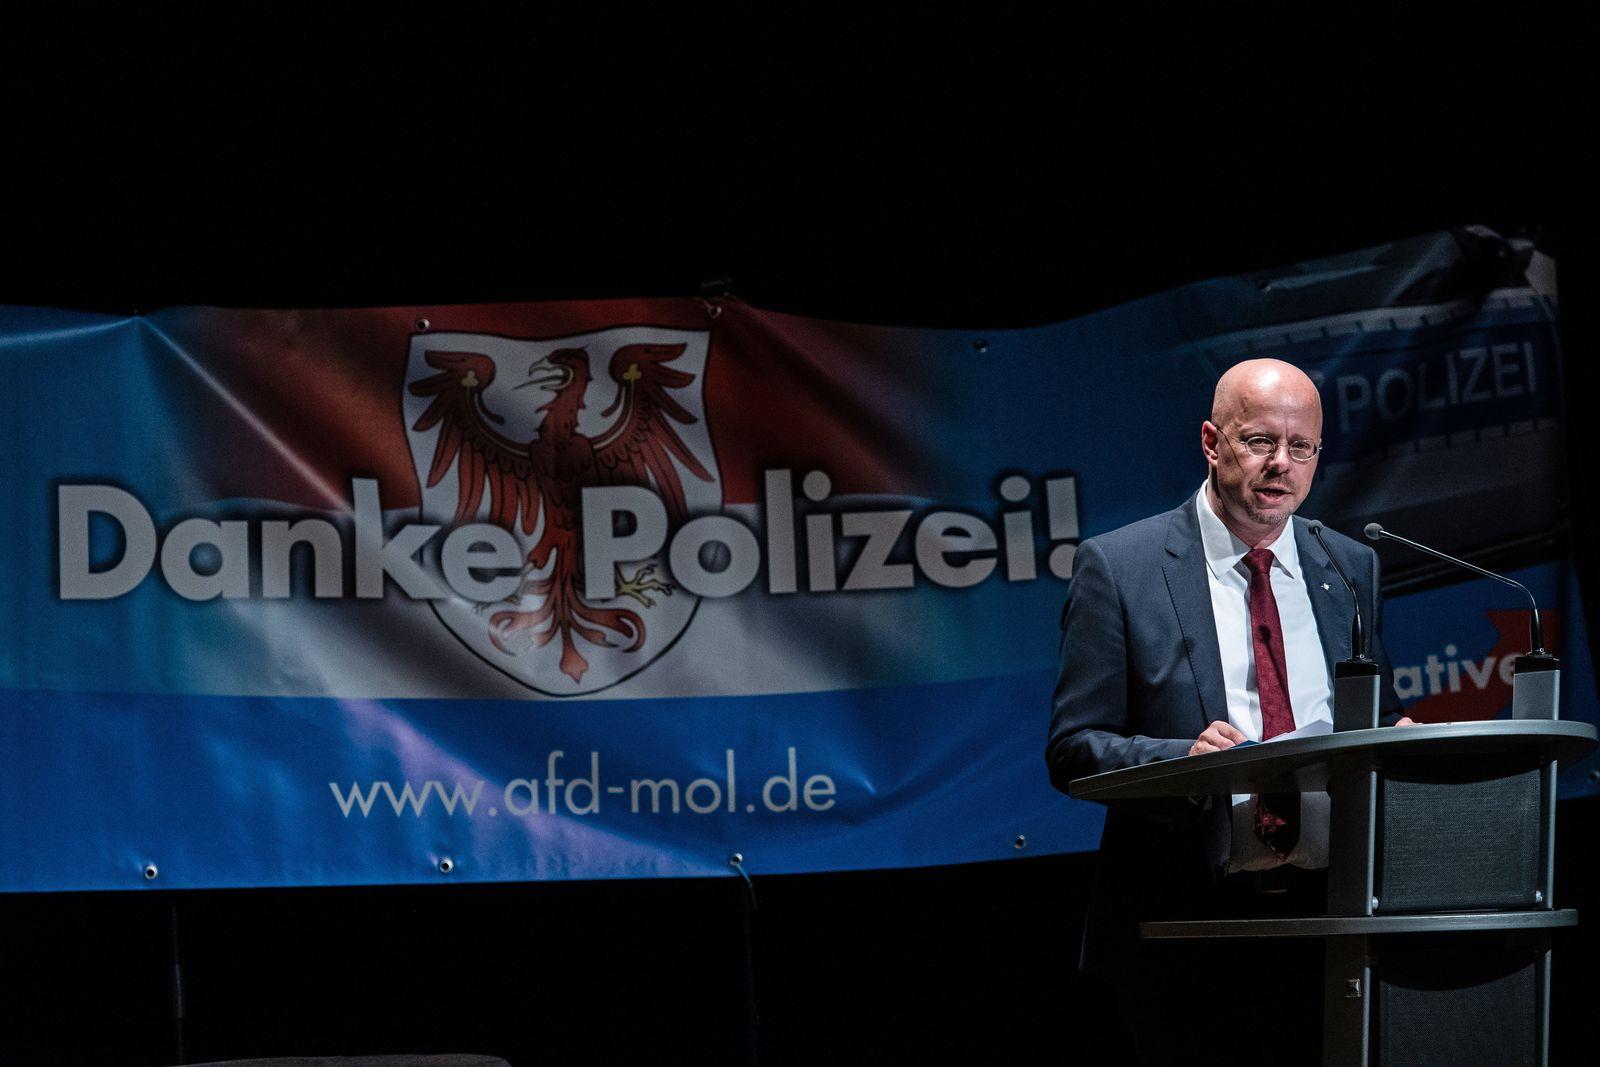 Kalbitz